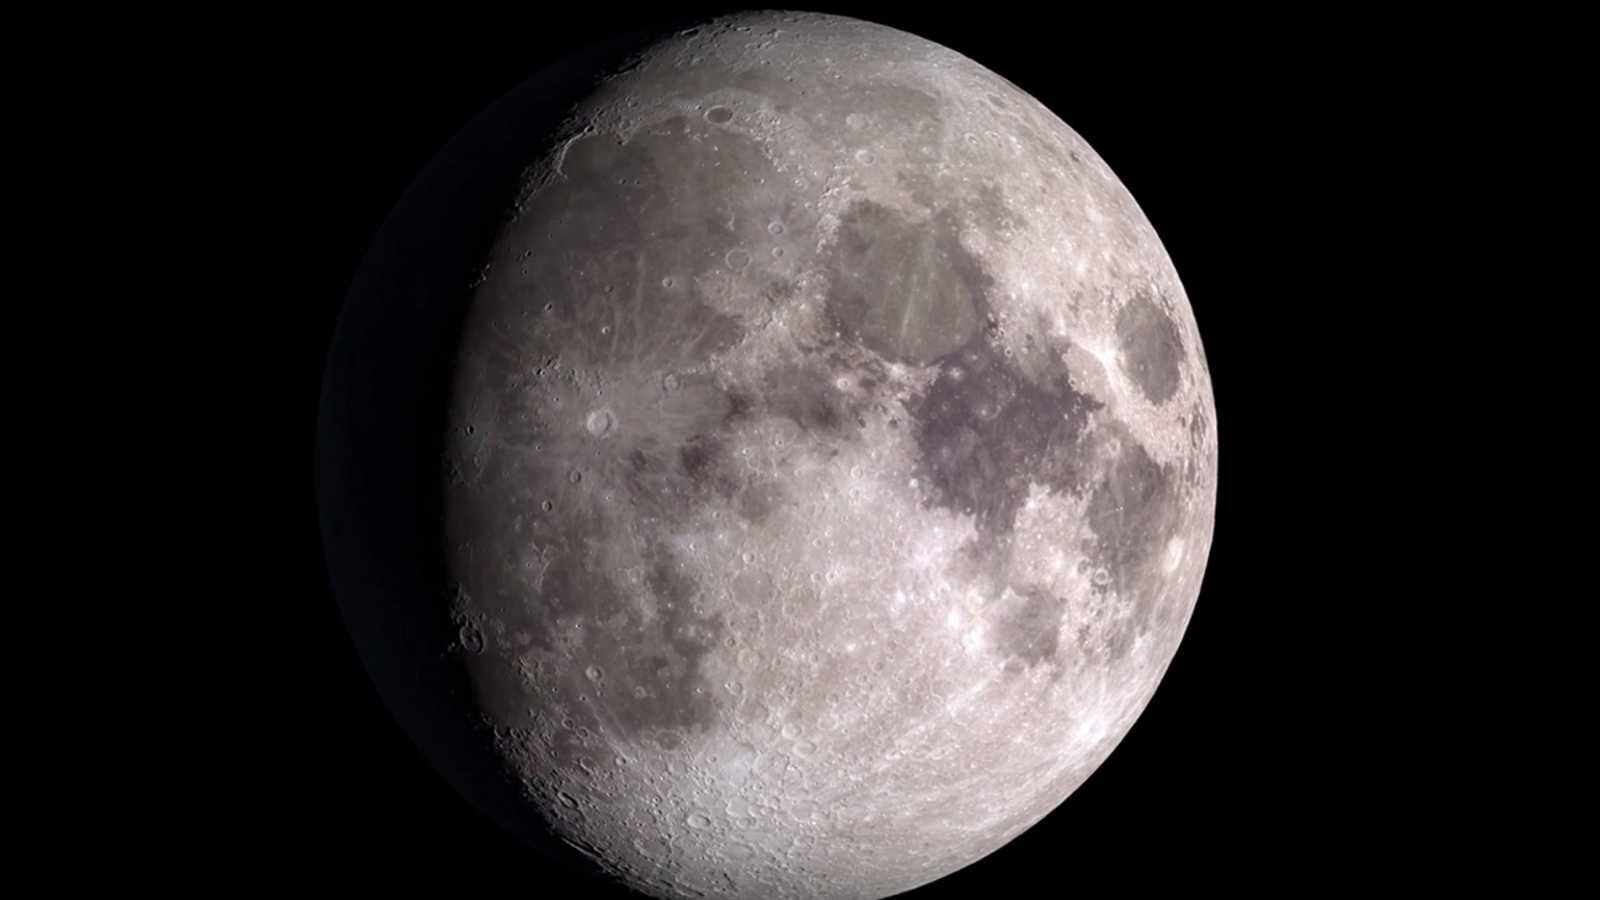 Un v deo de la nasa permite sobrevolar la luna en 4k for Mural la misma luna